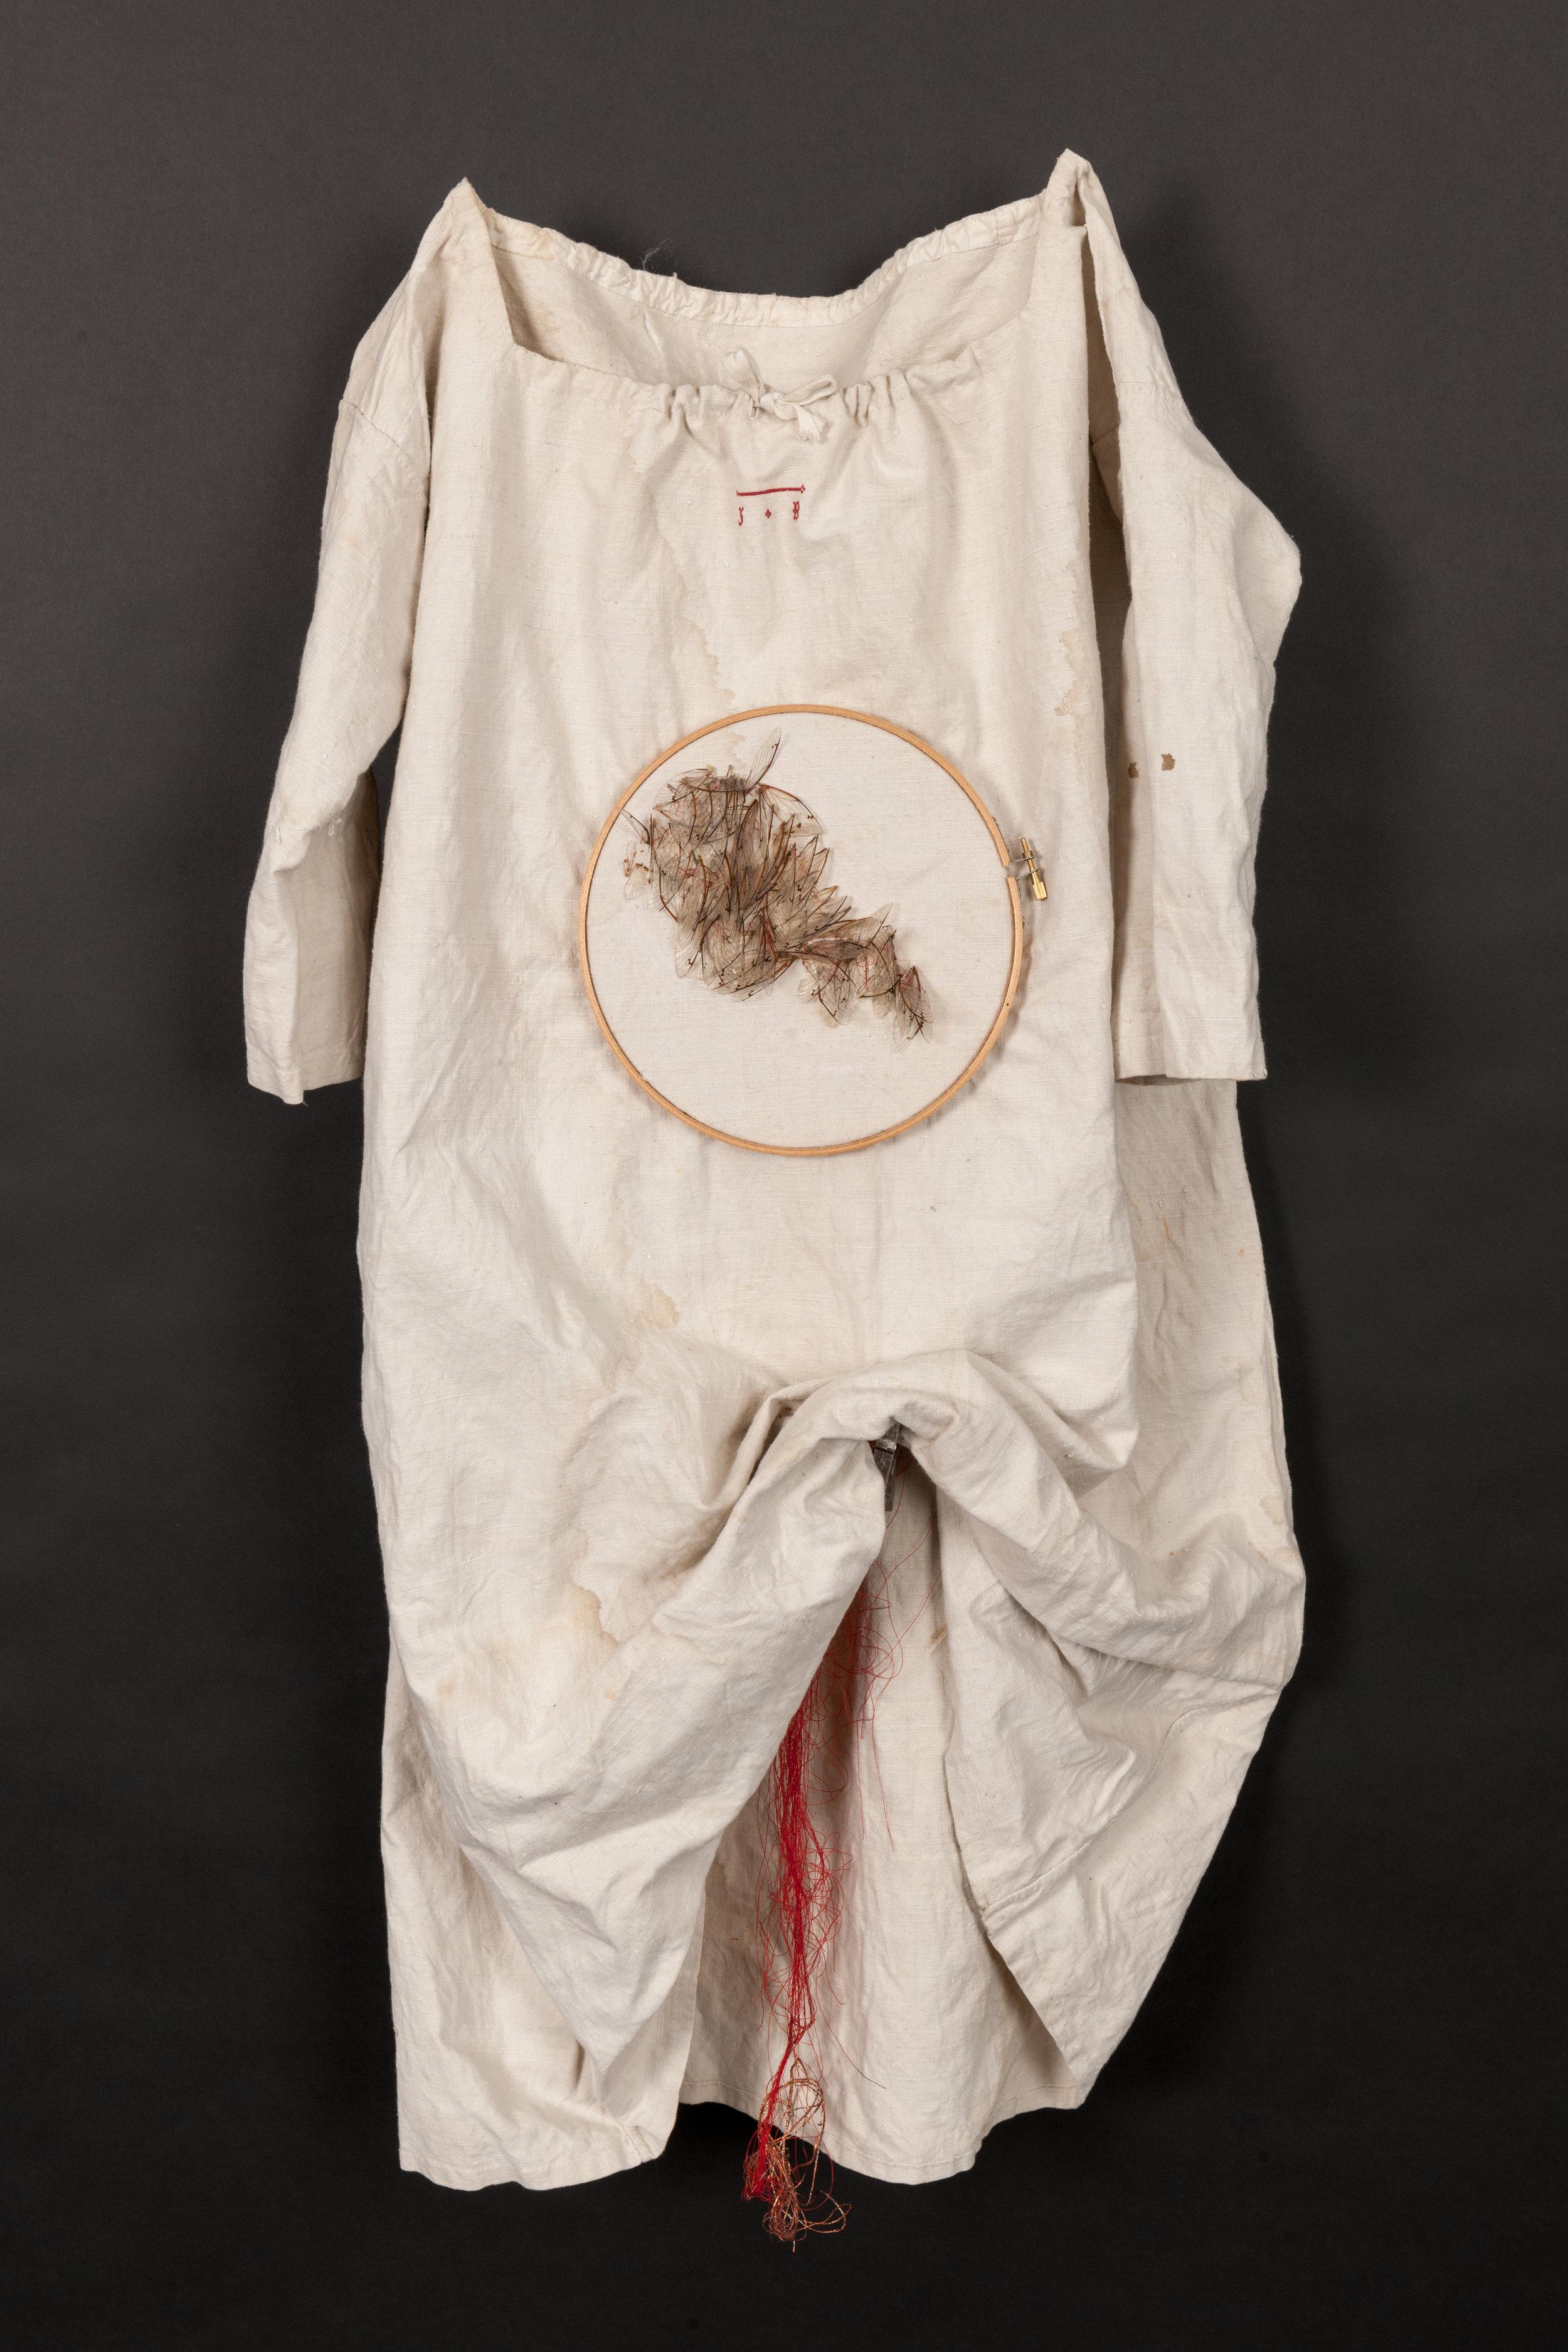 Rapacious Deeds - Linen, red thread, locust wings, wood frame, dimensions 85cm x 69cm, 2017 Image-Nu Image.jpg